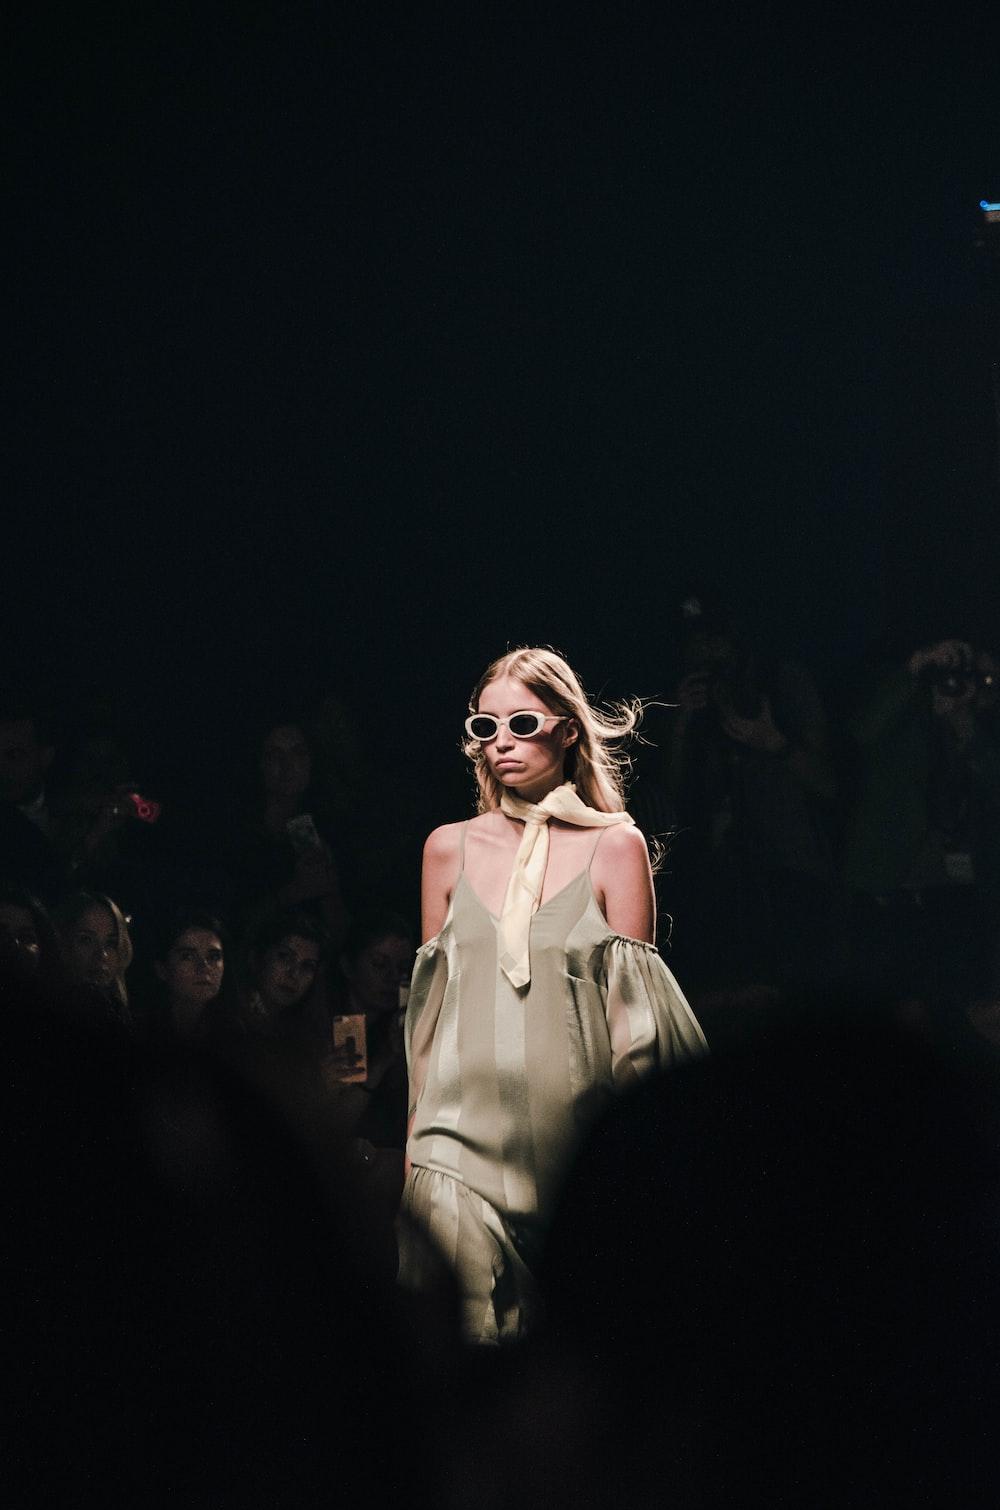 woman in white dress wearing sunglasses